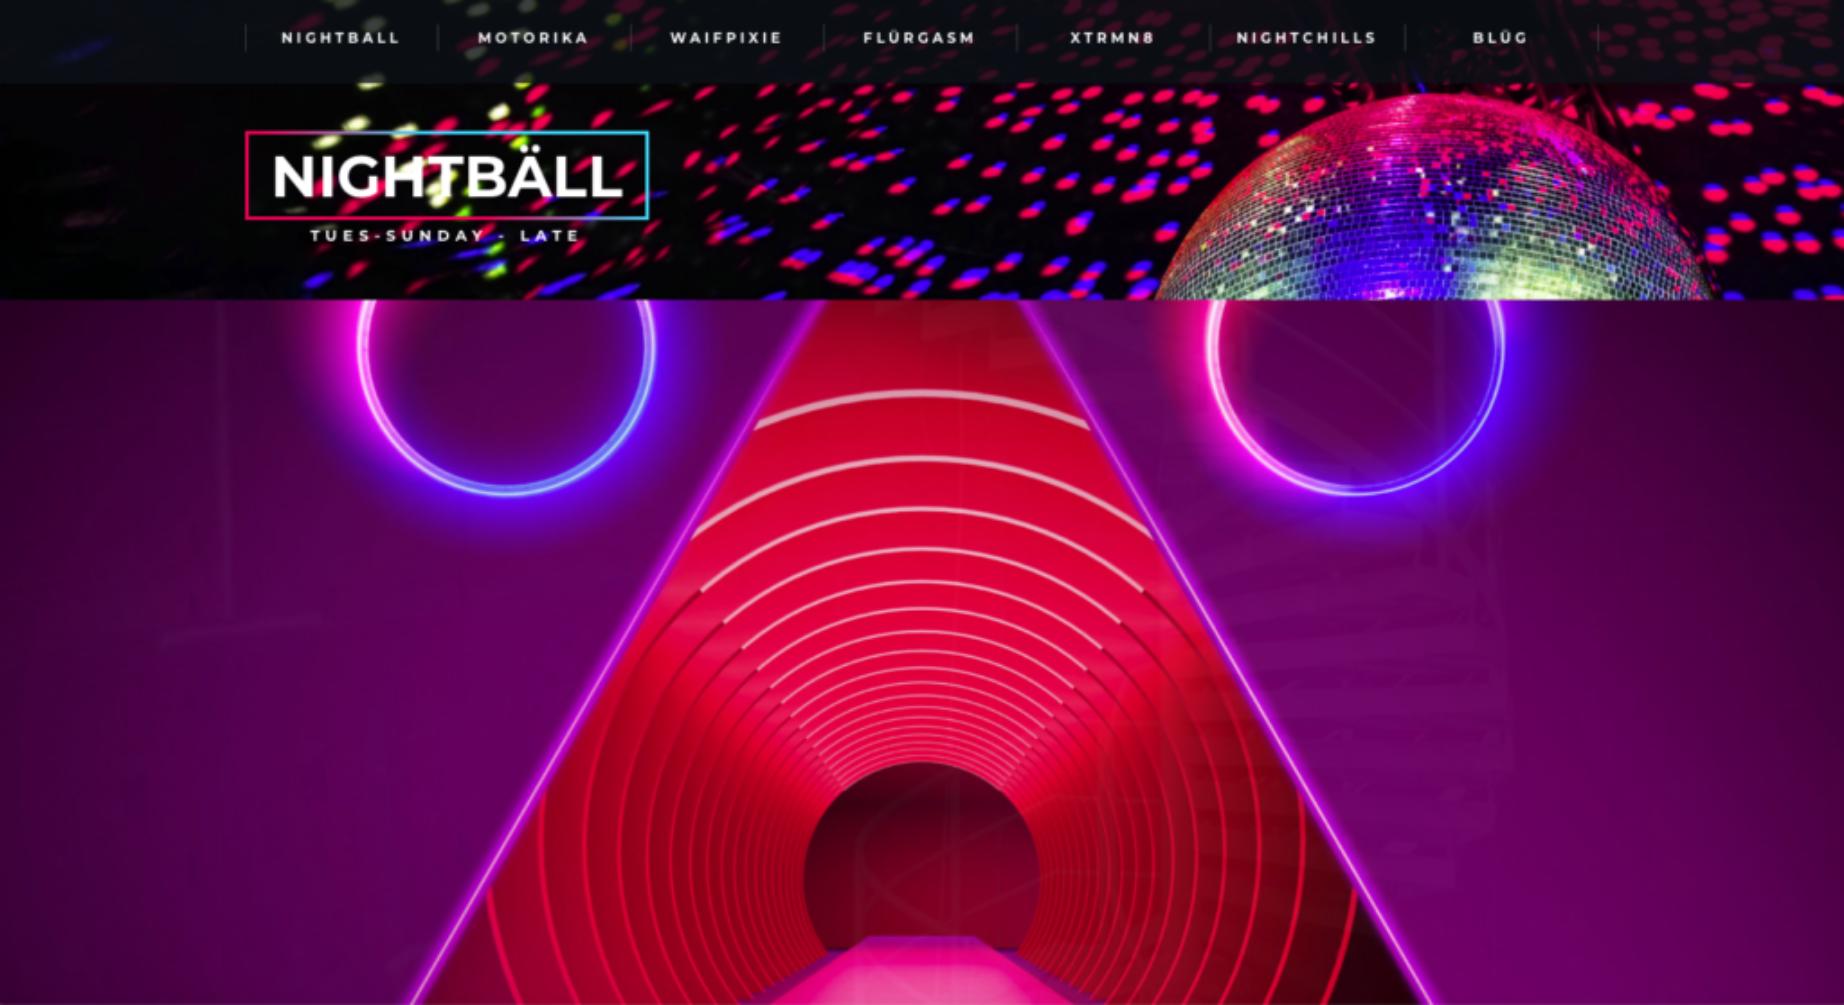 NIGHTball-Screen-15-Flurgasm 2